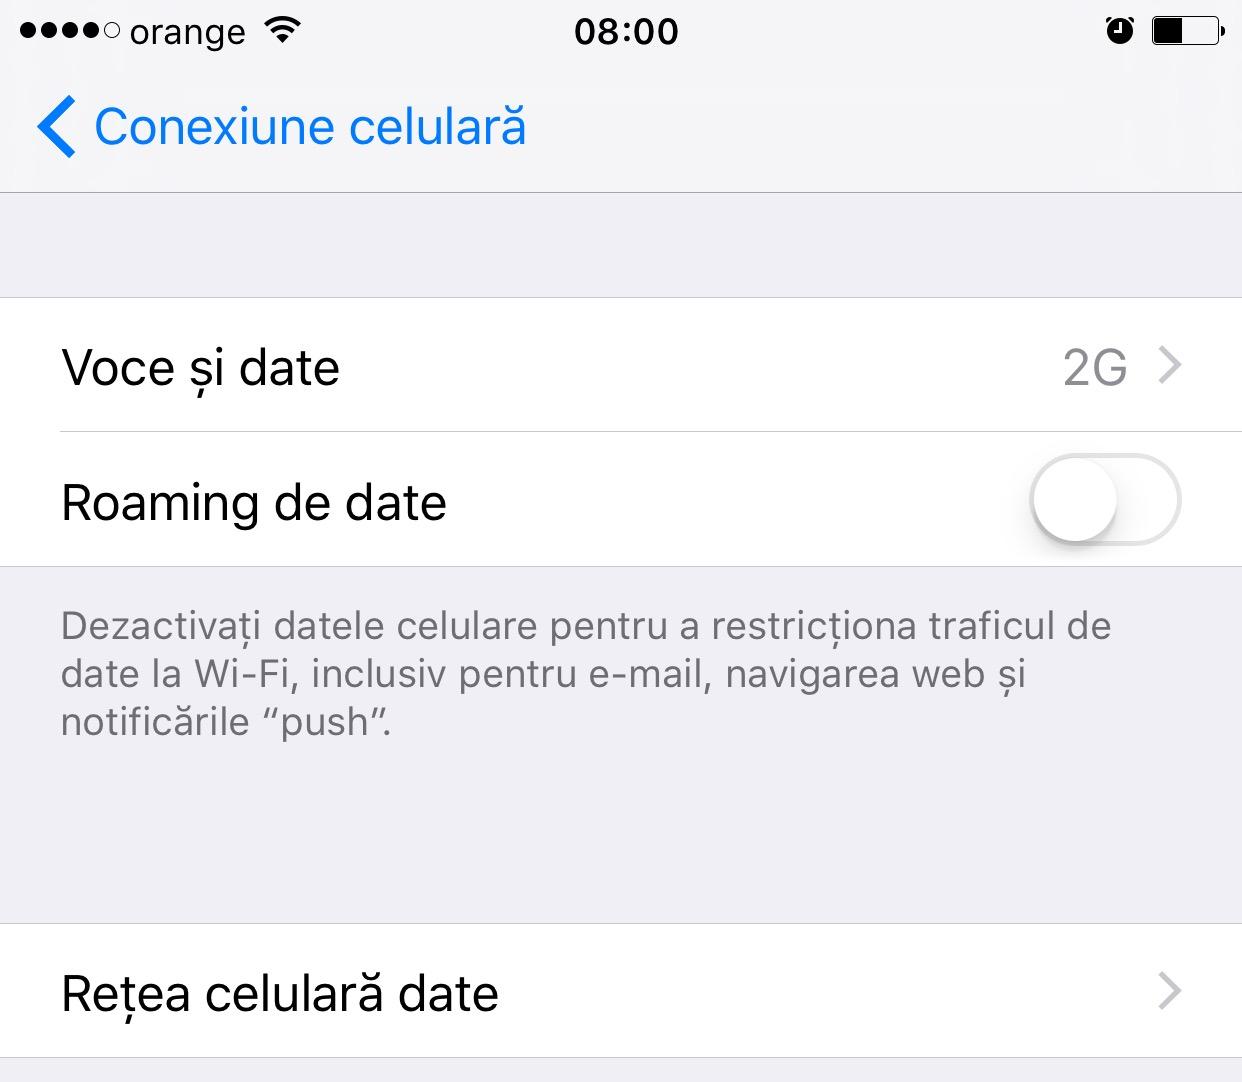 iOS9.3setariconexiunecelulara 1